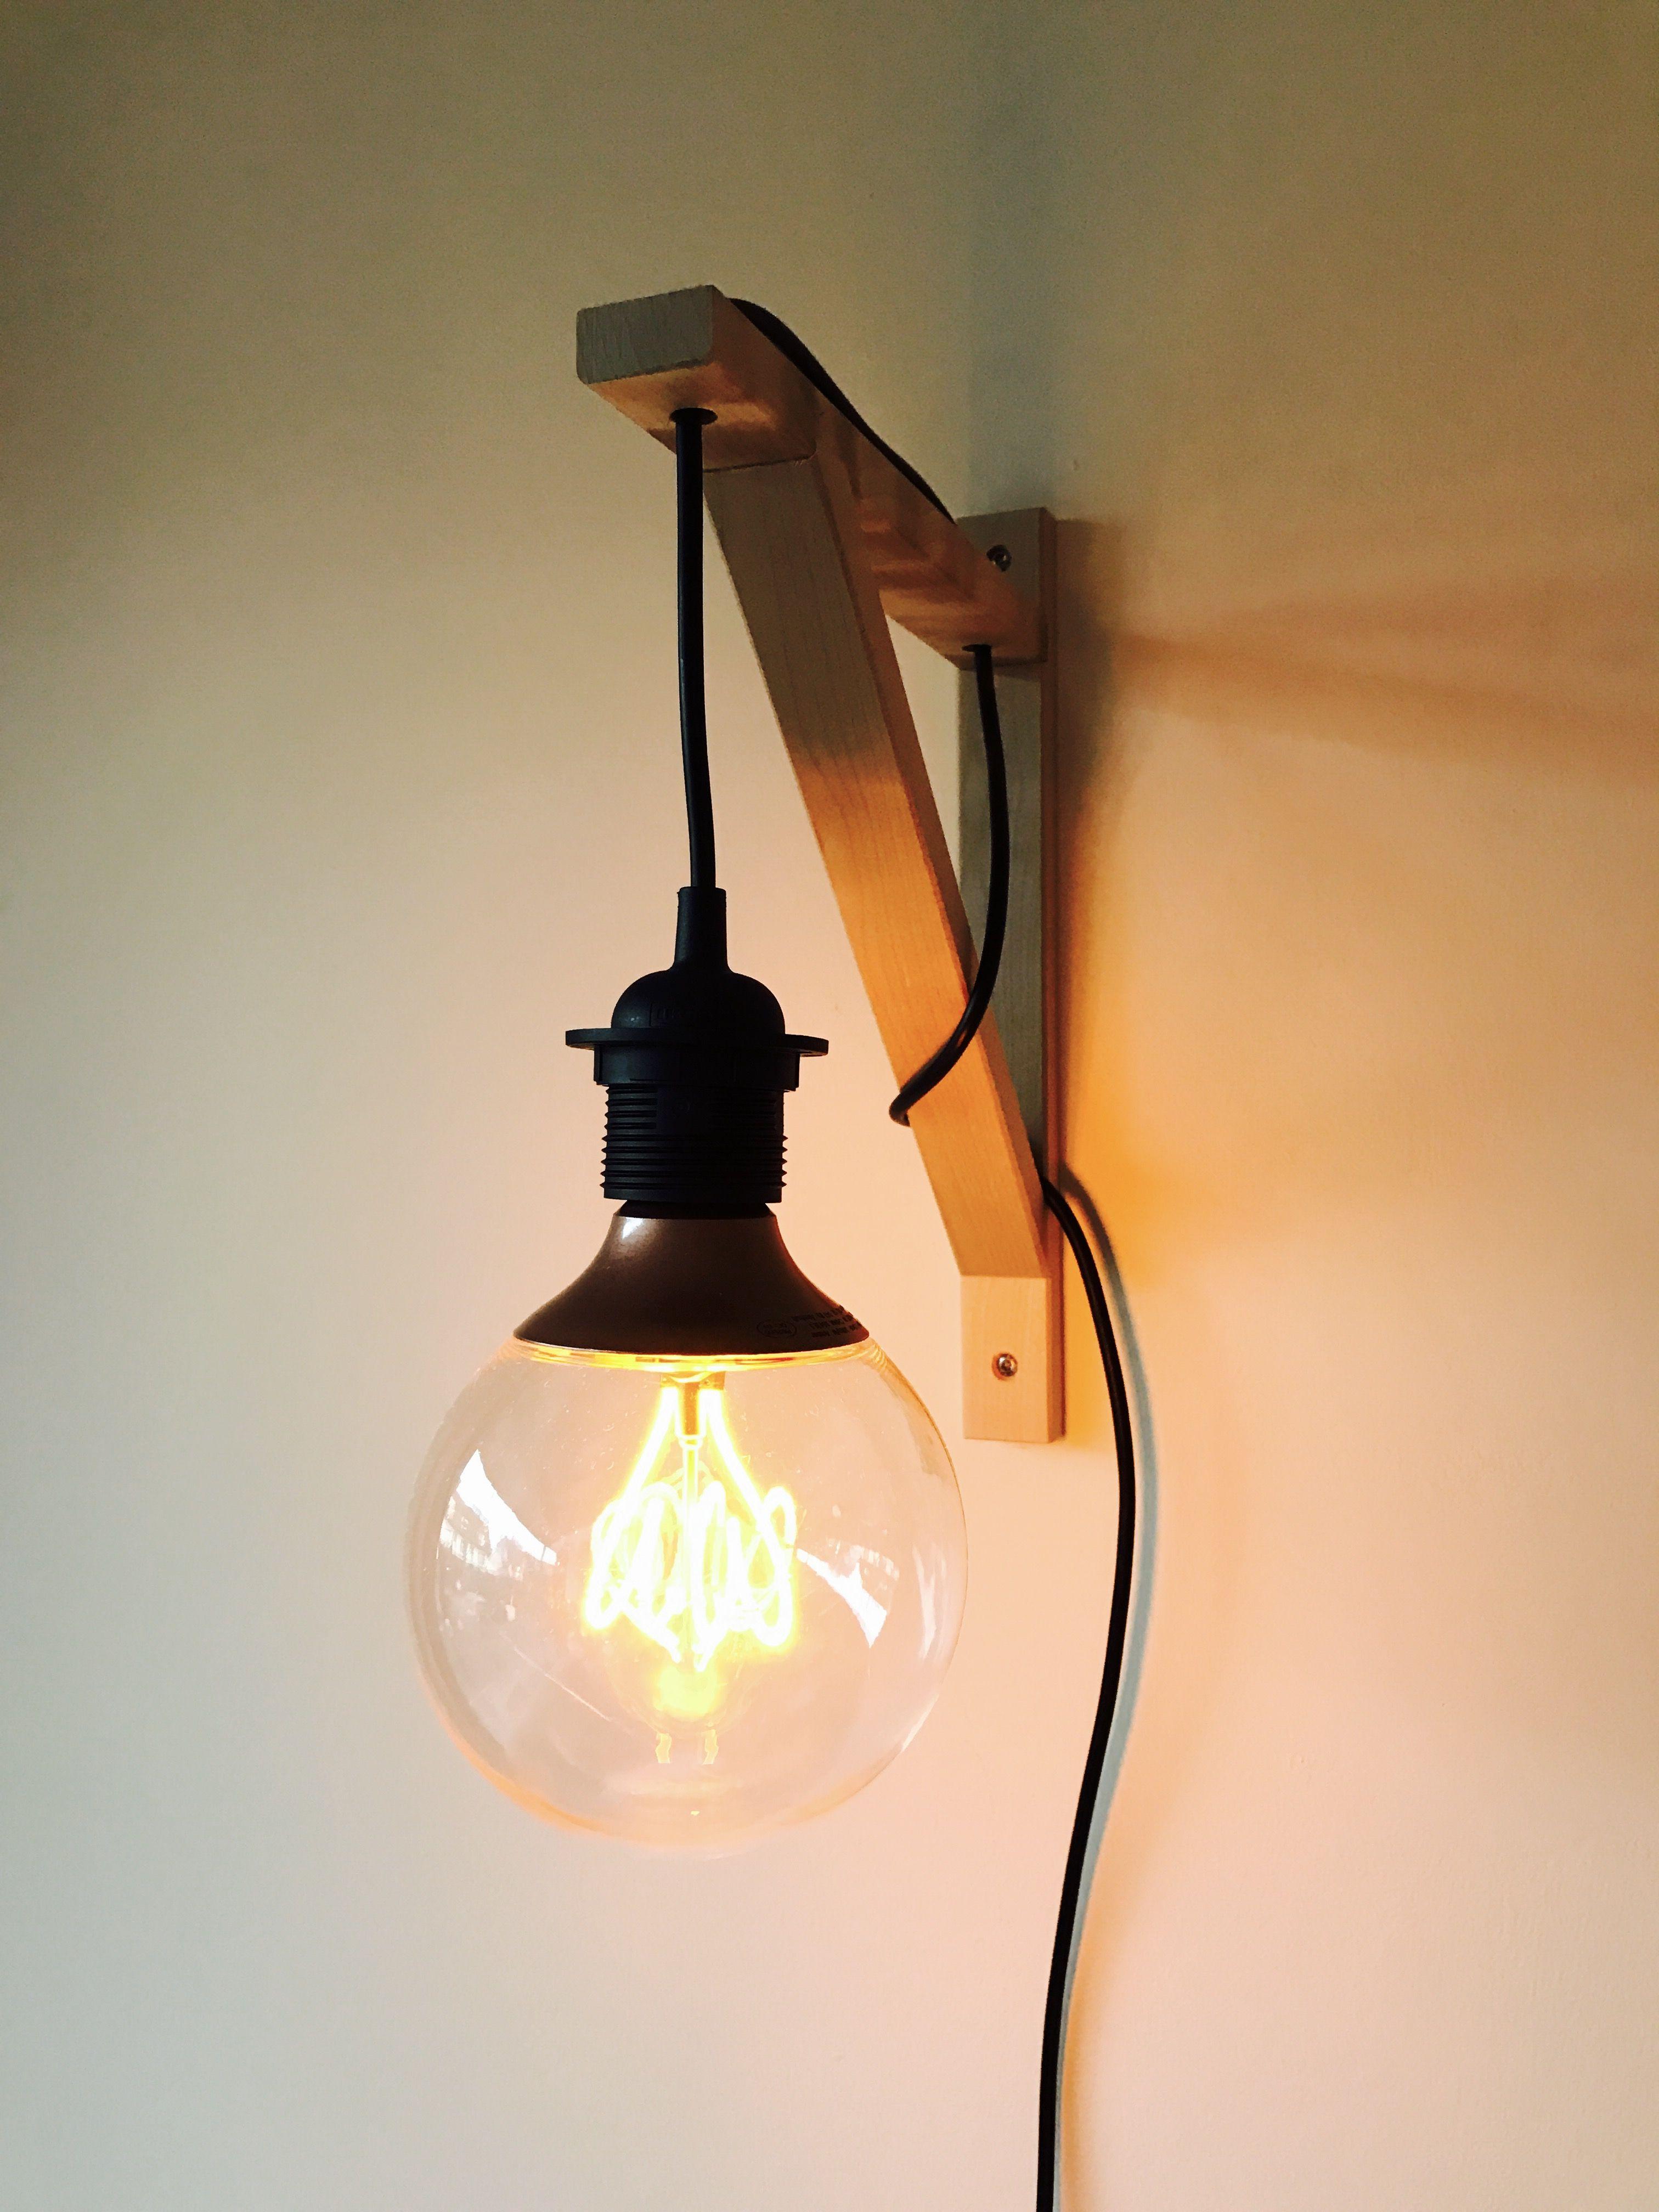 Ikea hack lampe an regalst tze raumgestaltung for Raumgestaltung ikea